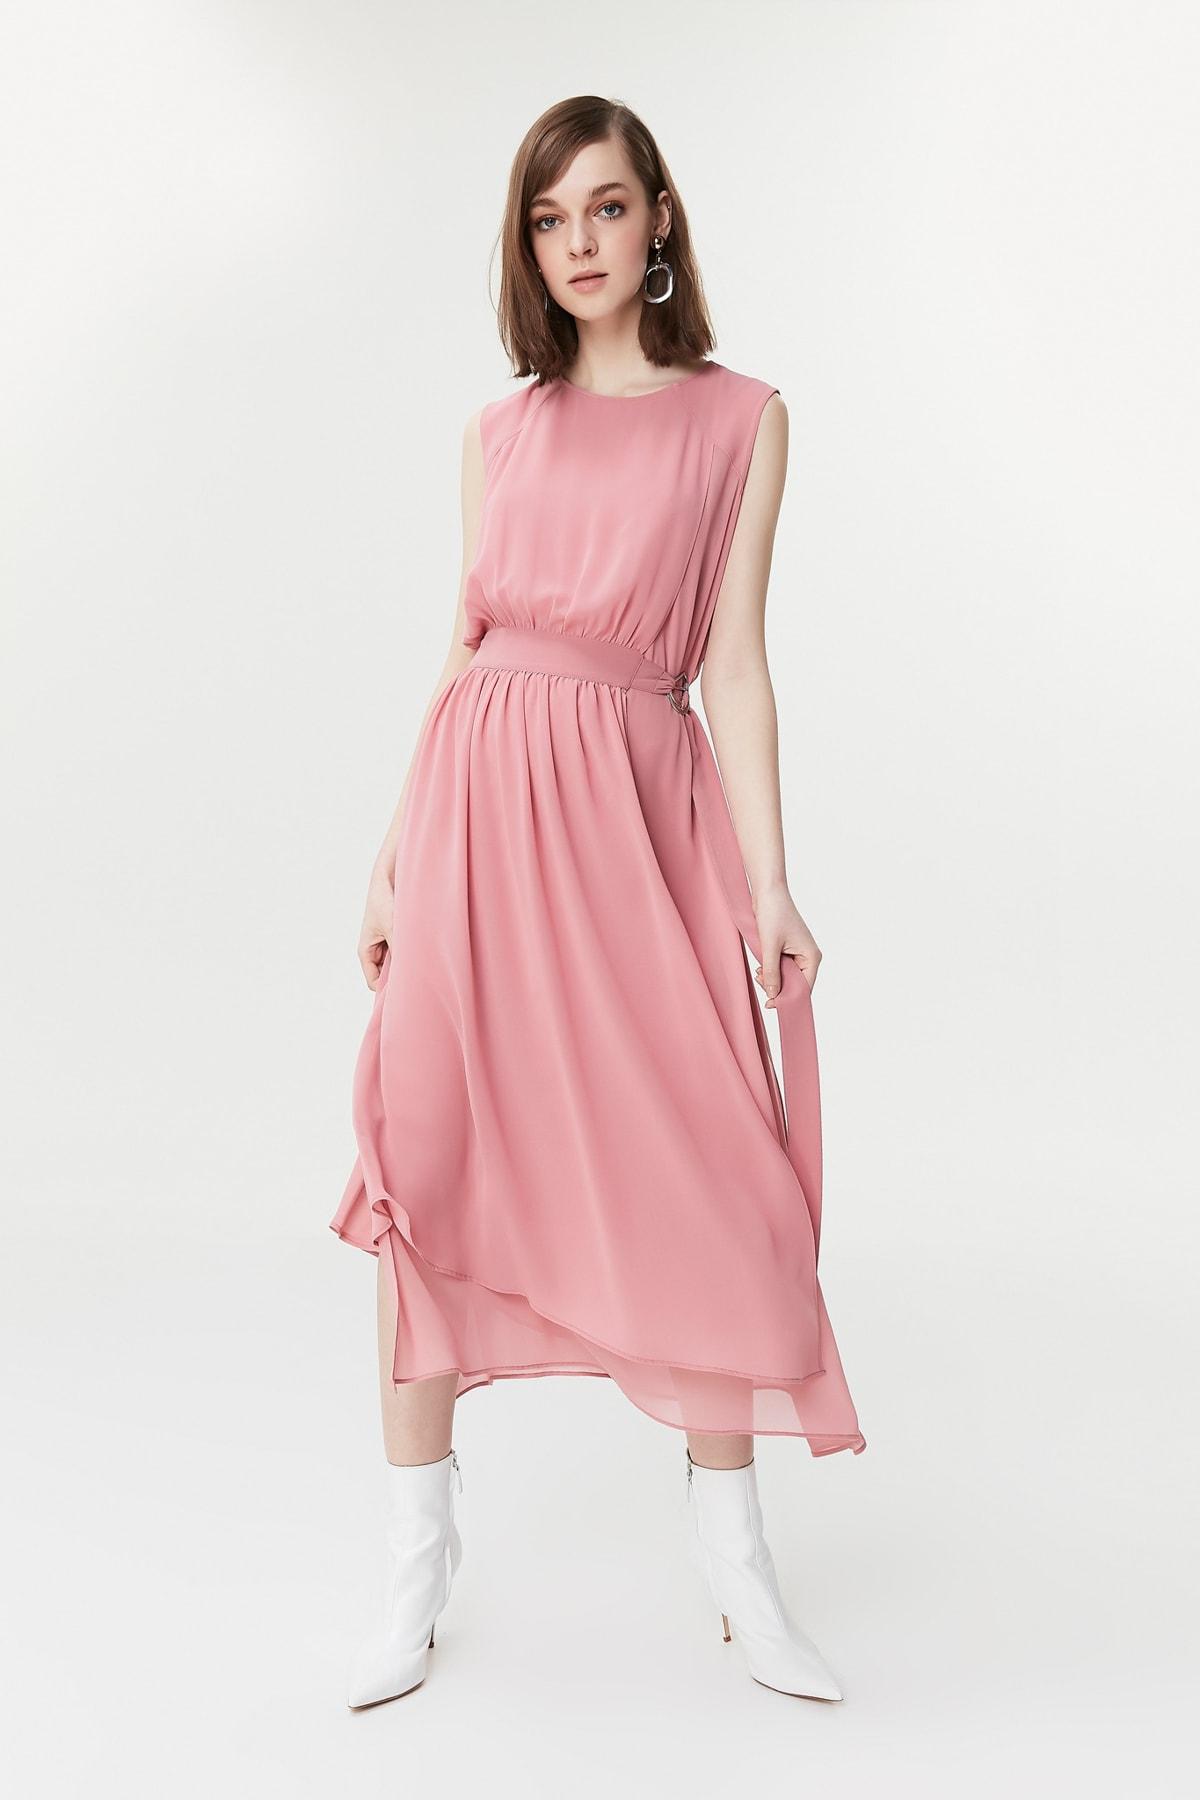 İpekyol Kadın Pudra Elbise IS1190002267 2